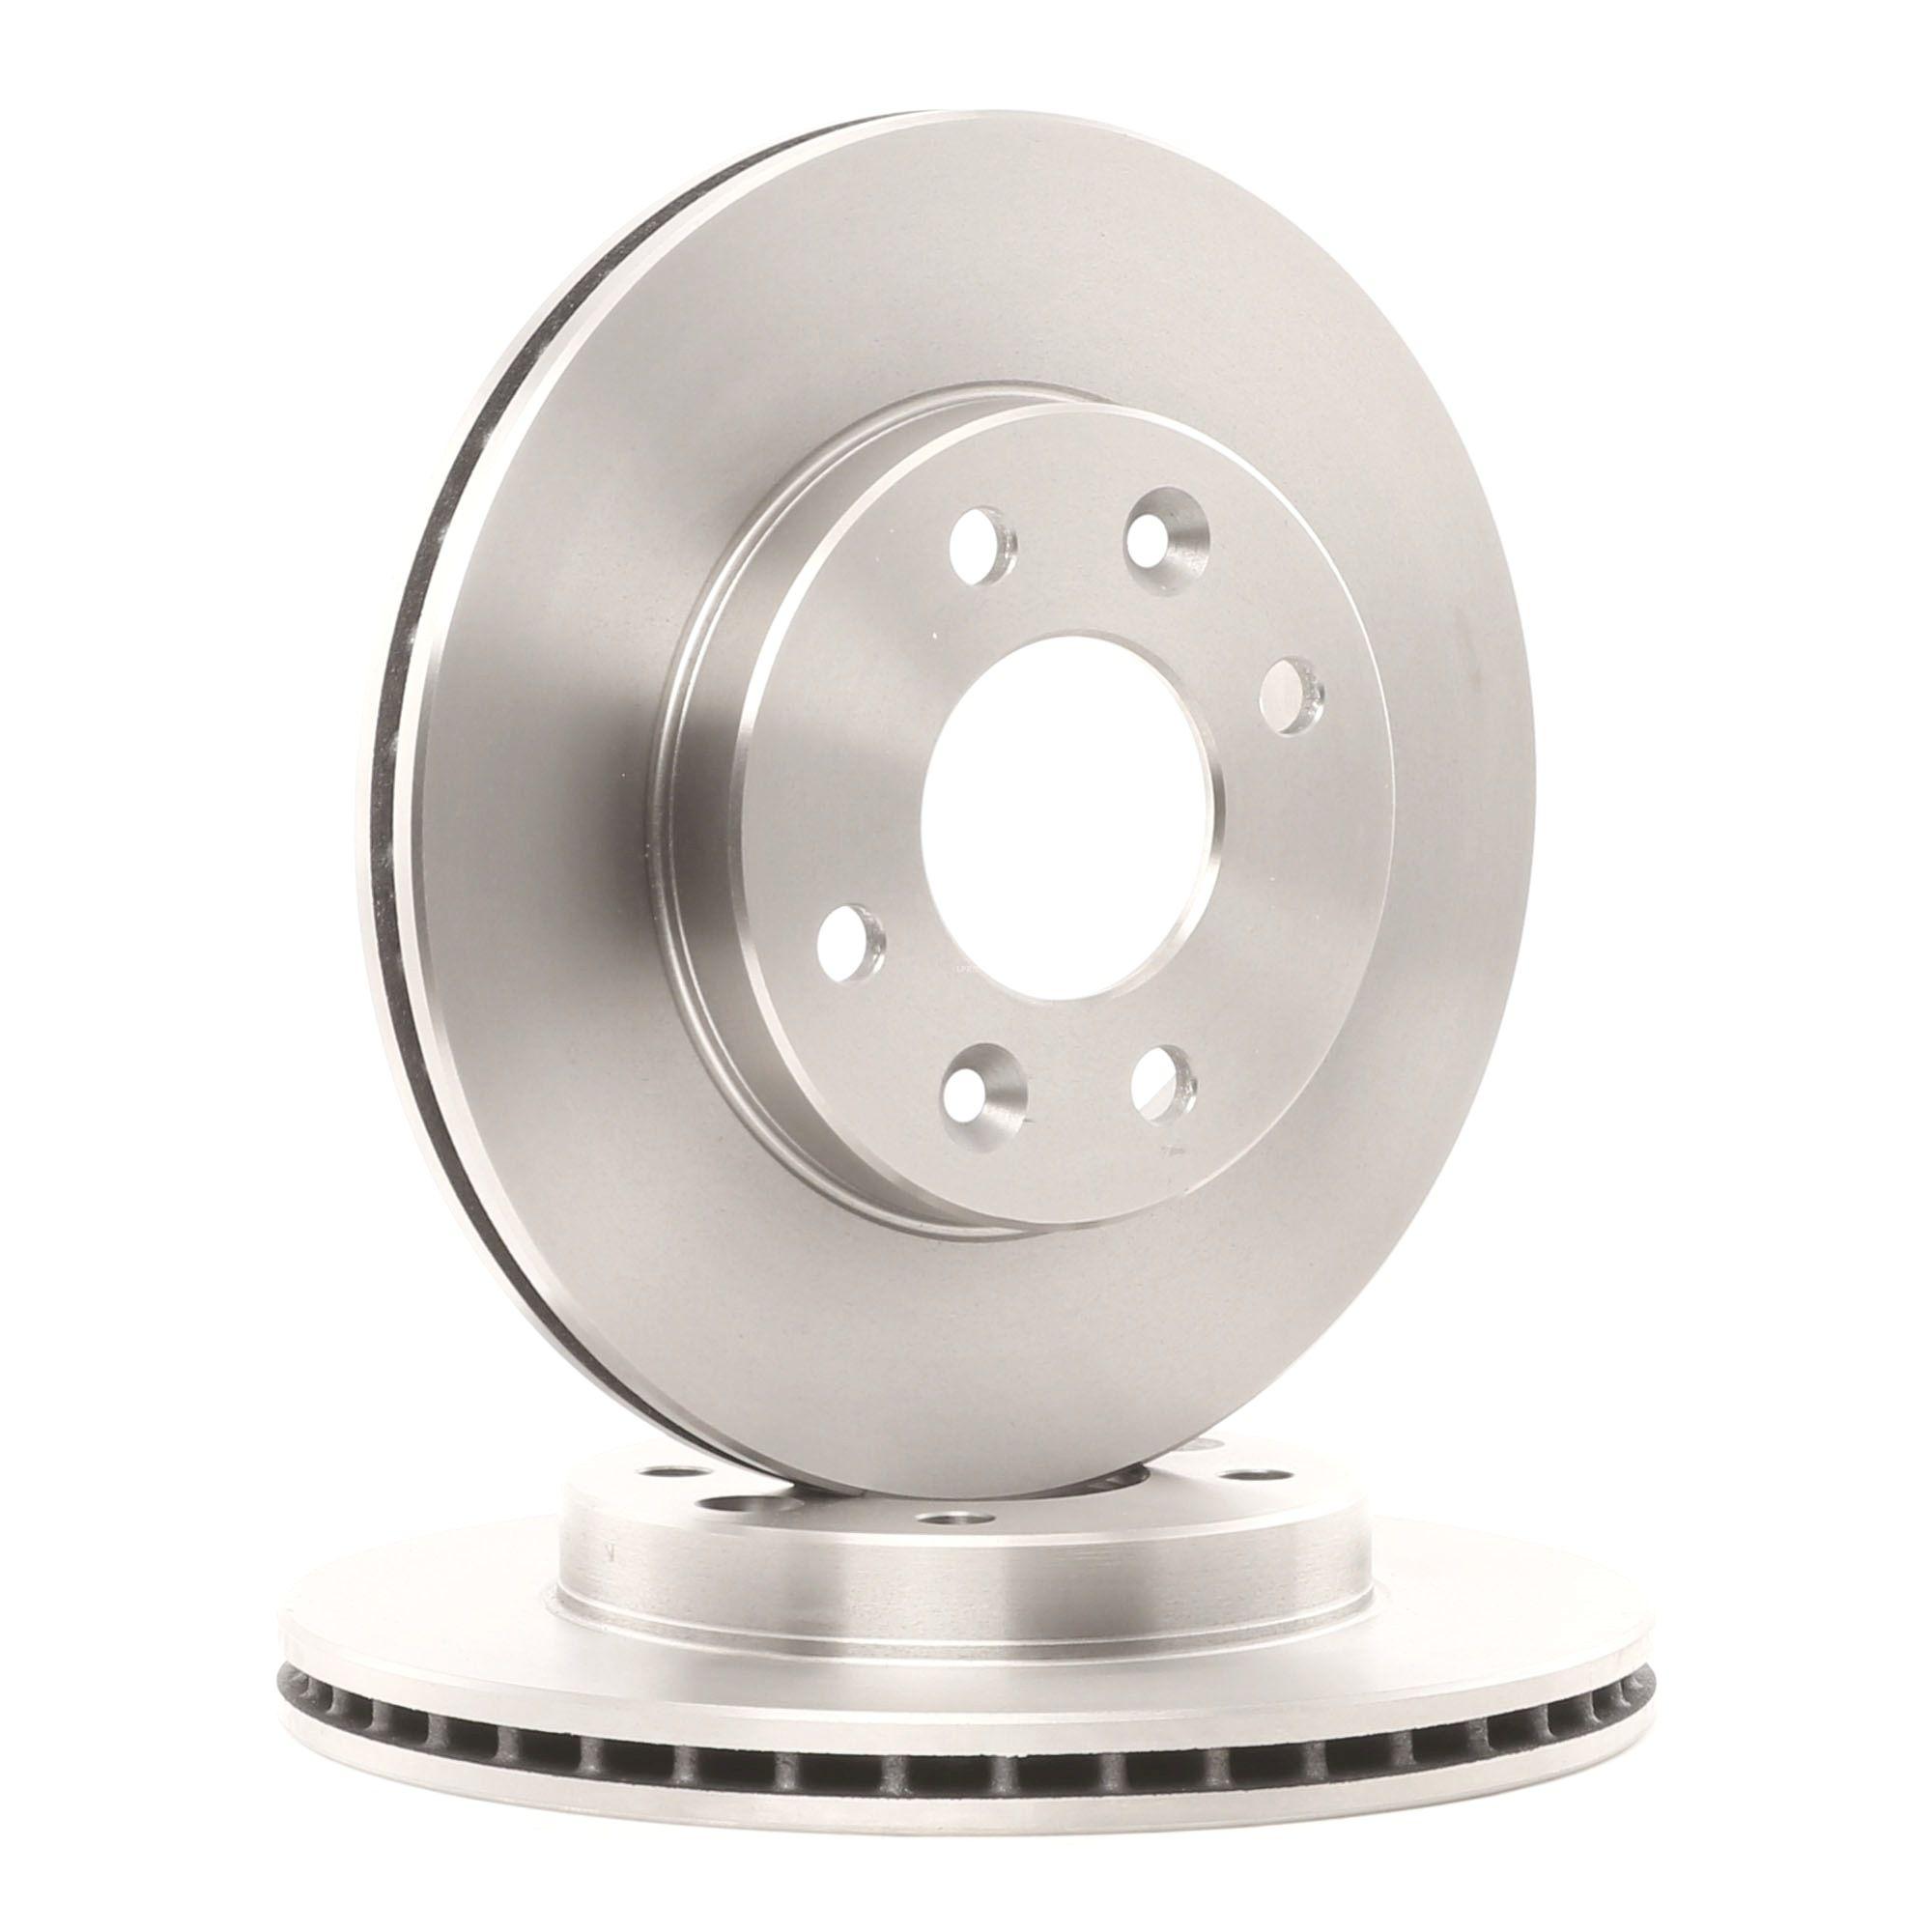 Pirkti R1111V LPR 3 Ø: 238mm, žiedas: 4-anga, stabdžių disko storis: 20mm Stabdžių diskas R1111V nebrangu